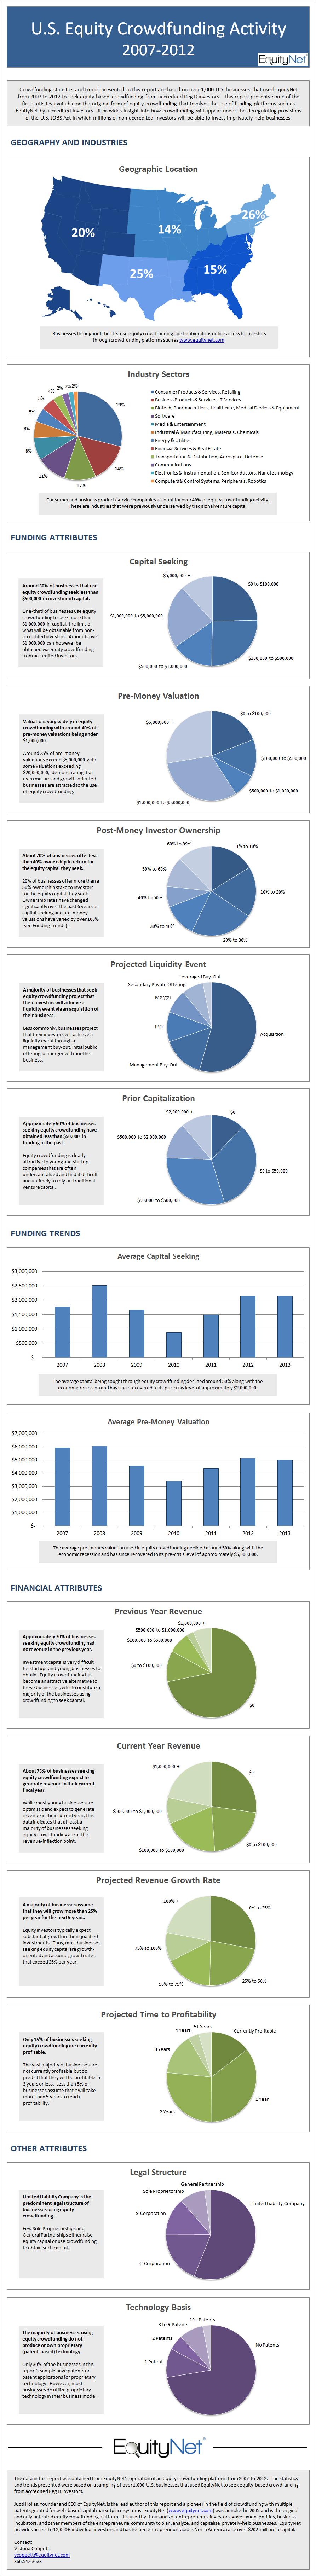 Equity Crowdfunding - EquityNet.com